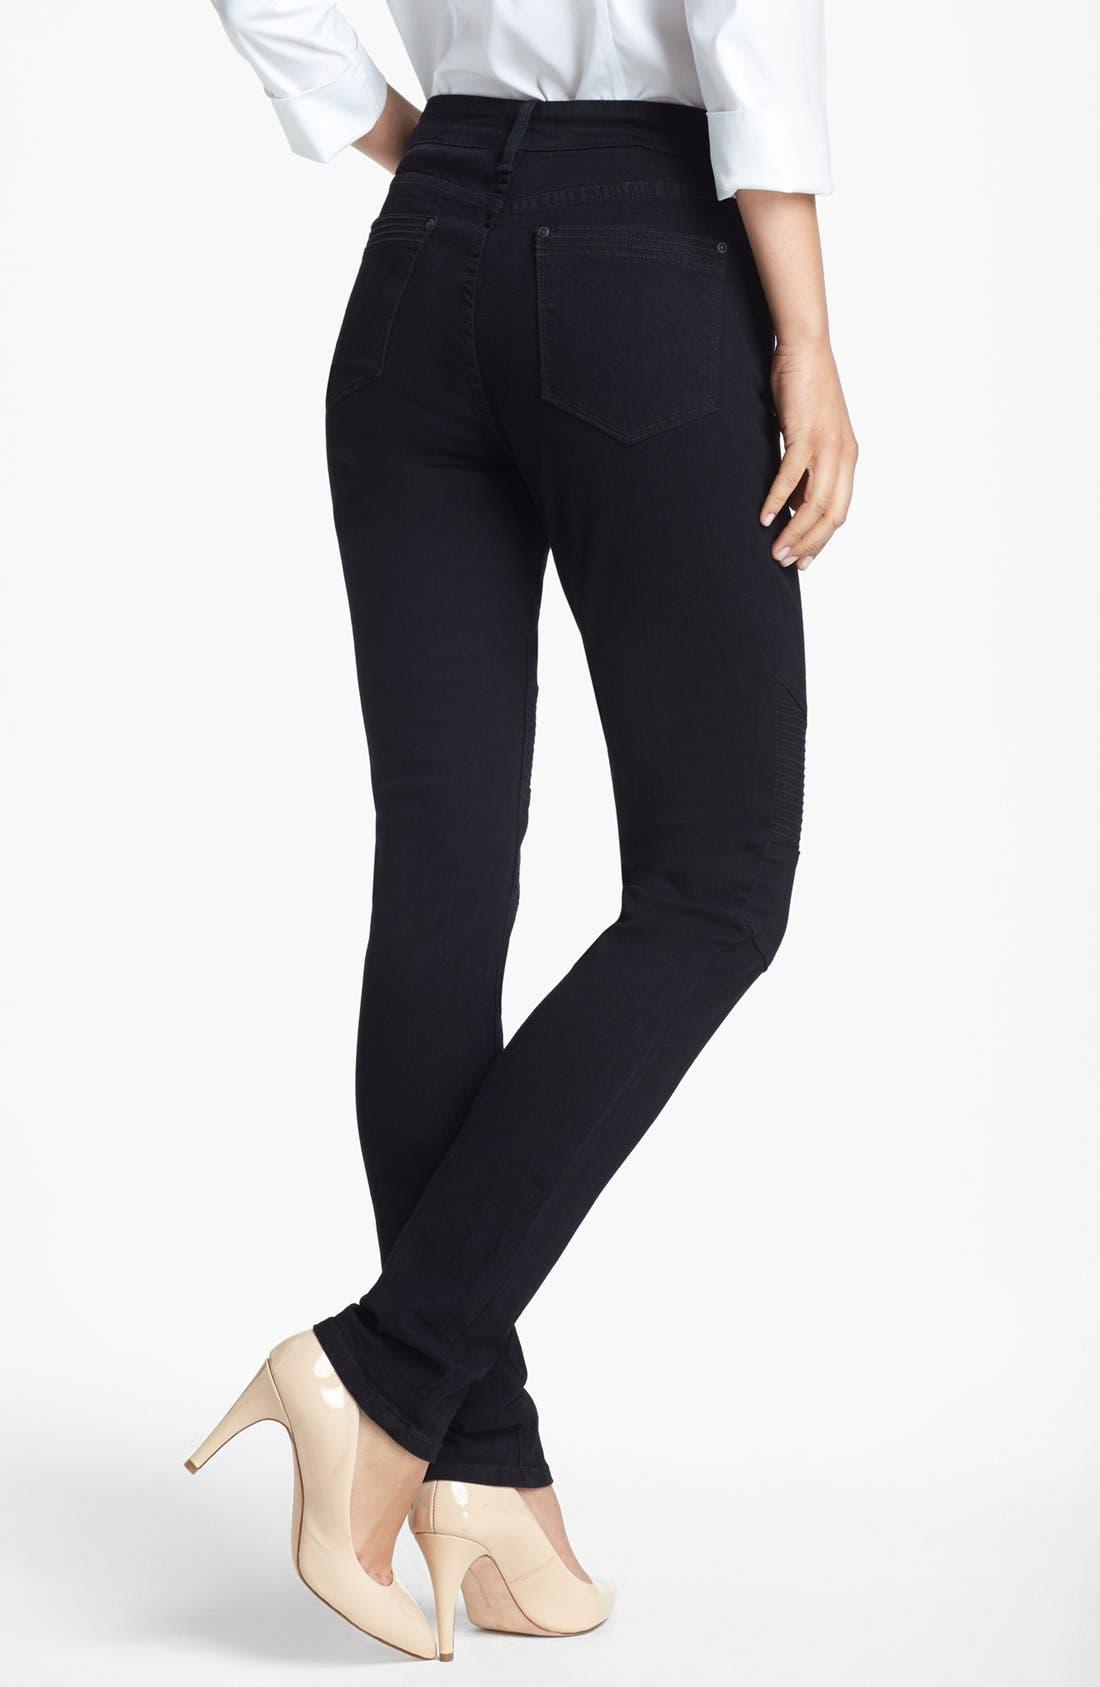 Alternate Image 2  - NYDJ Gabriella' Stretch Moto Skinny Jeans (Black)